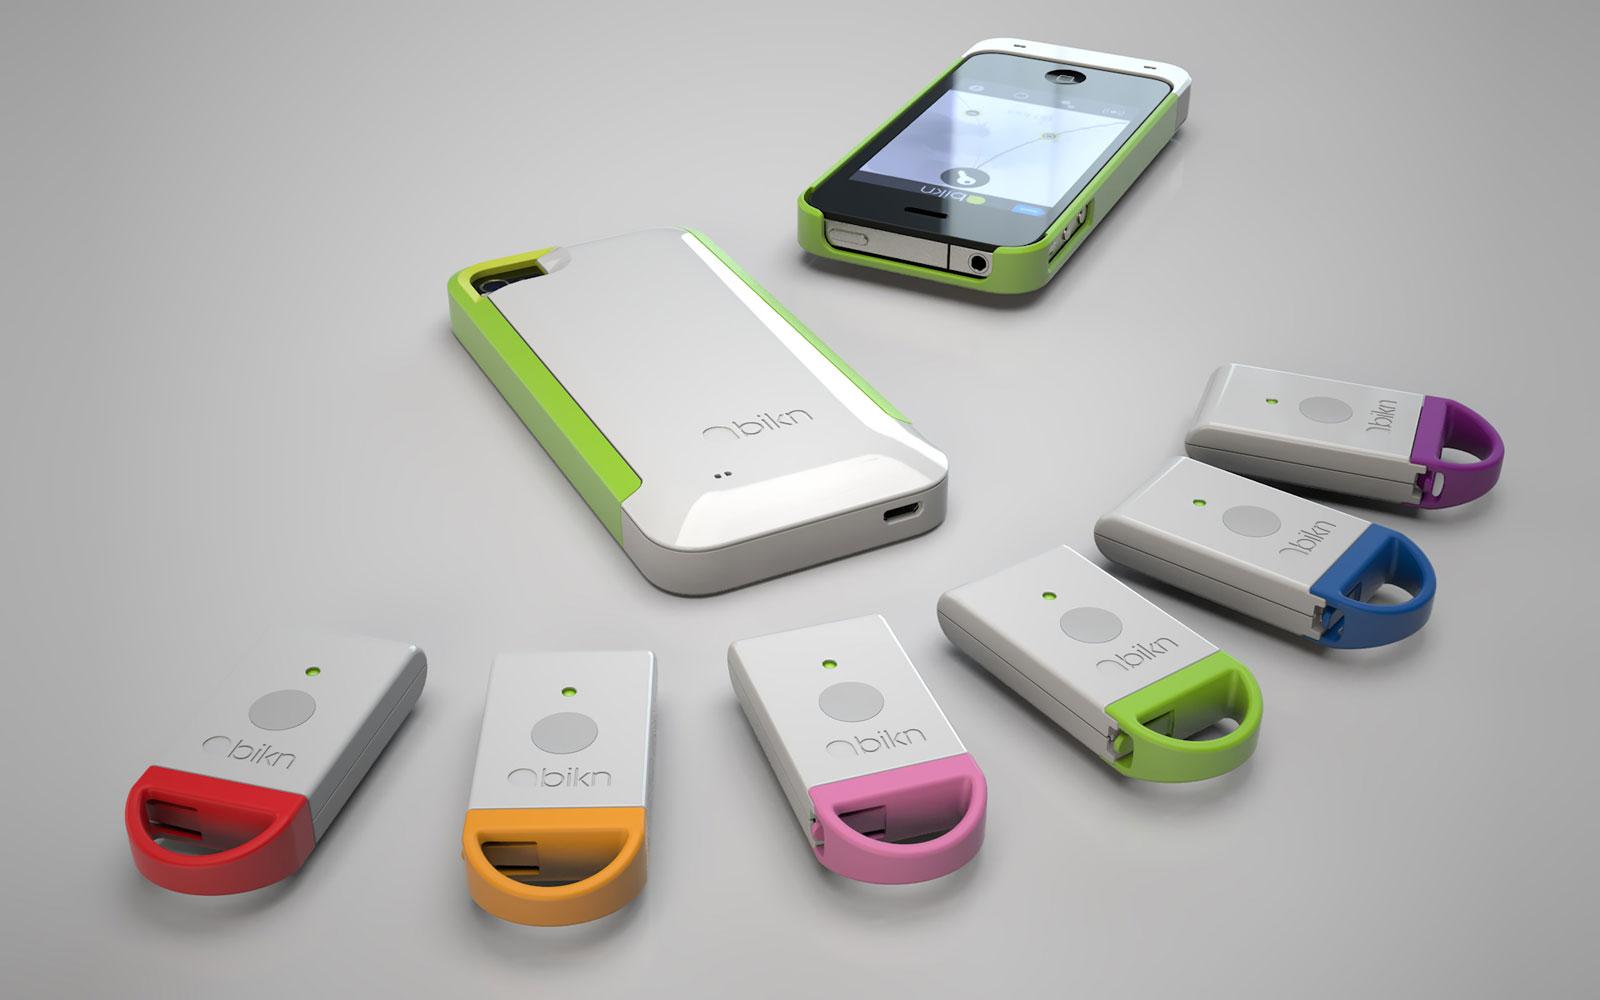 Bikn - Smart Tag System